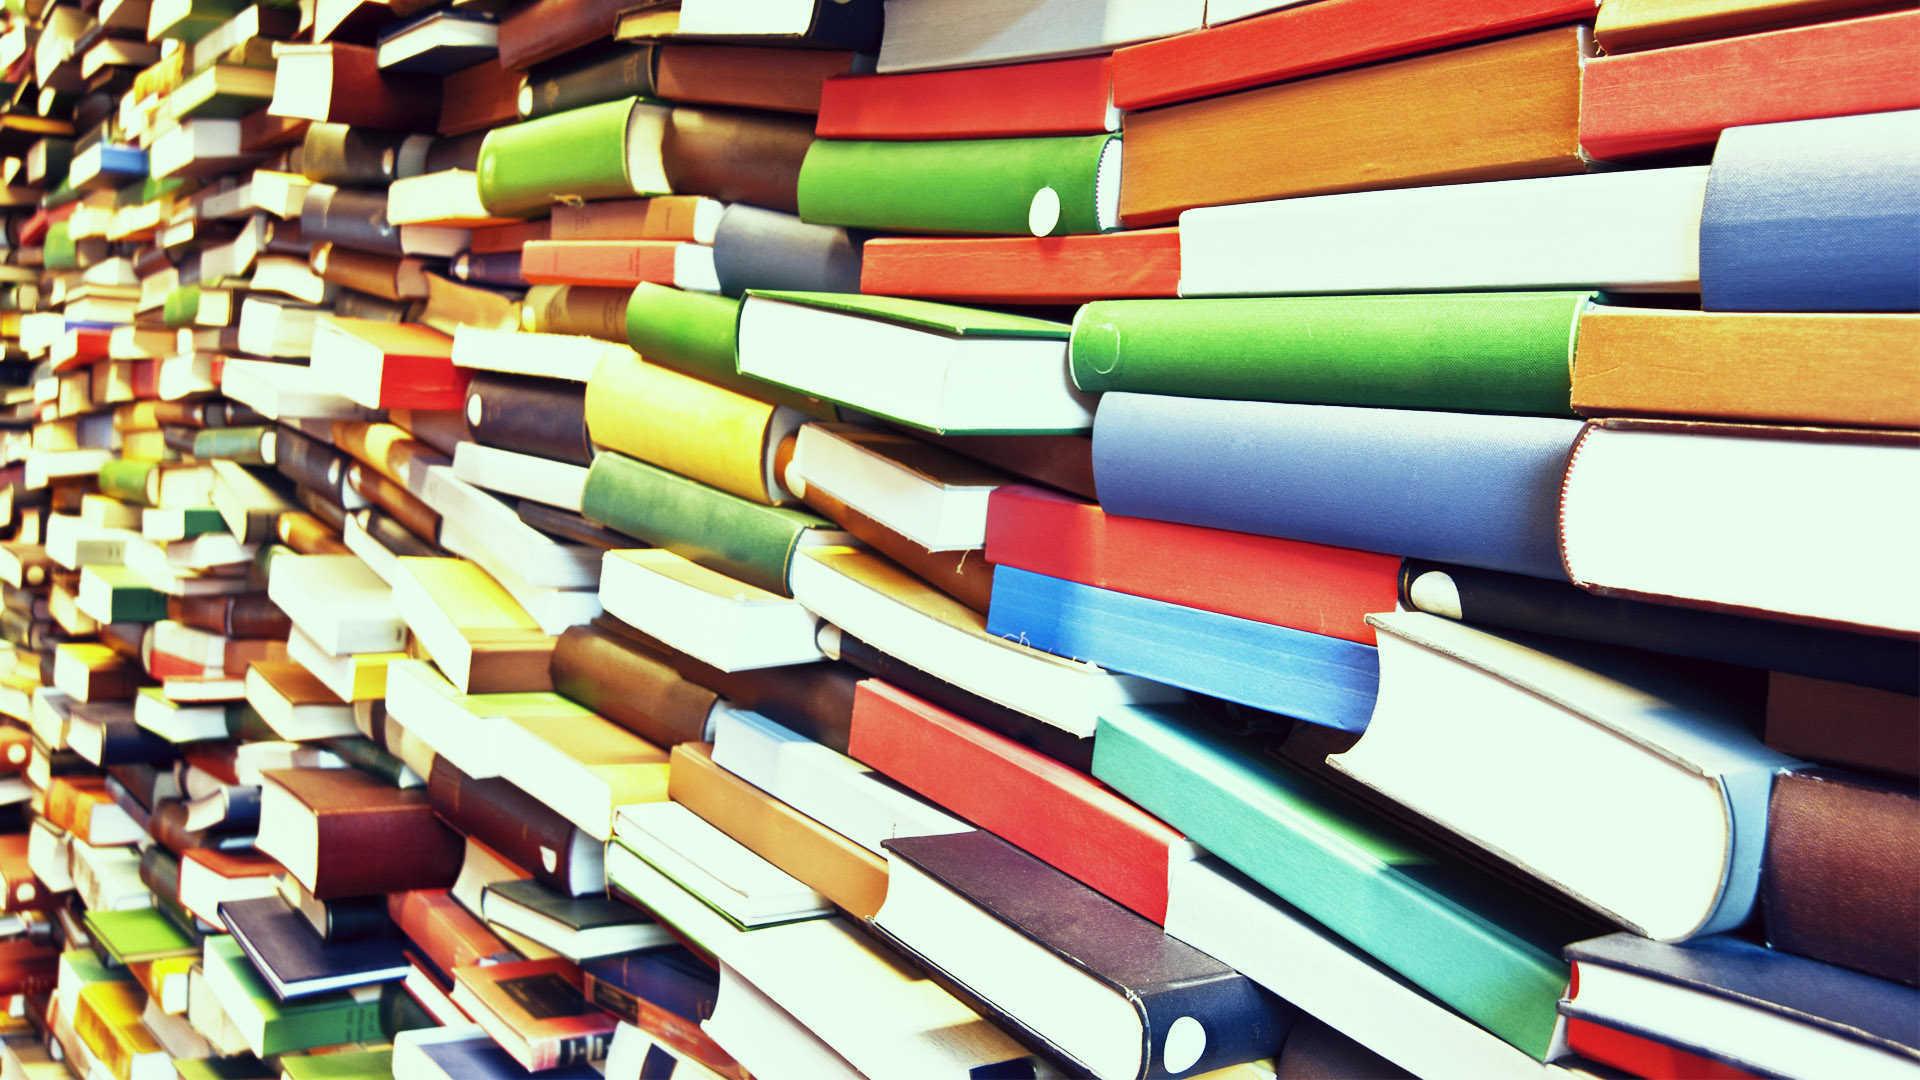 library books wallpaper hd wwwpixsharkcom images